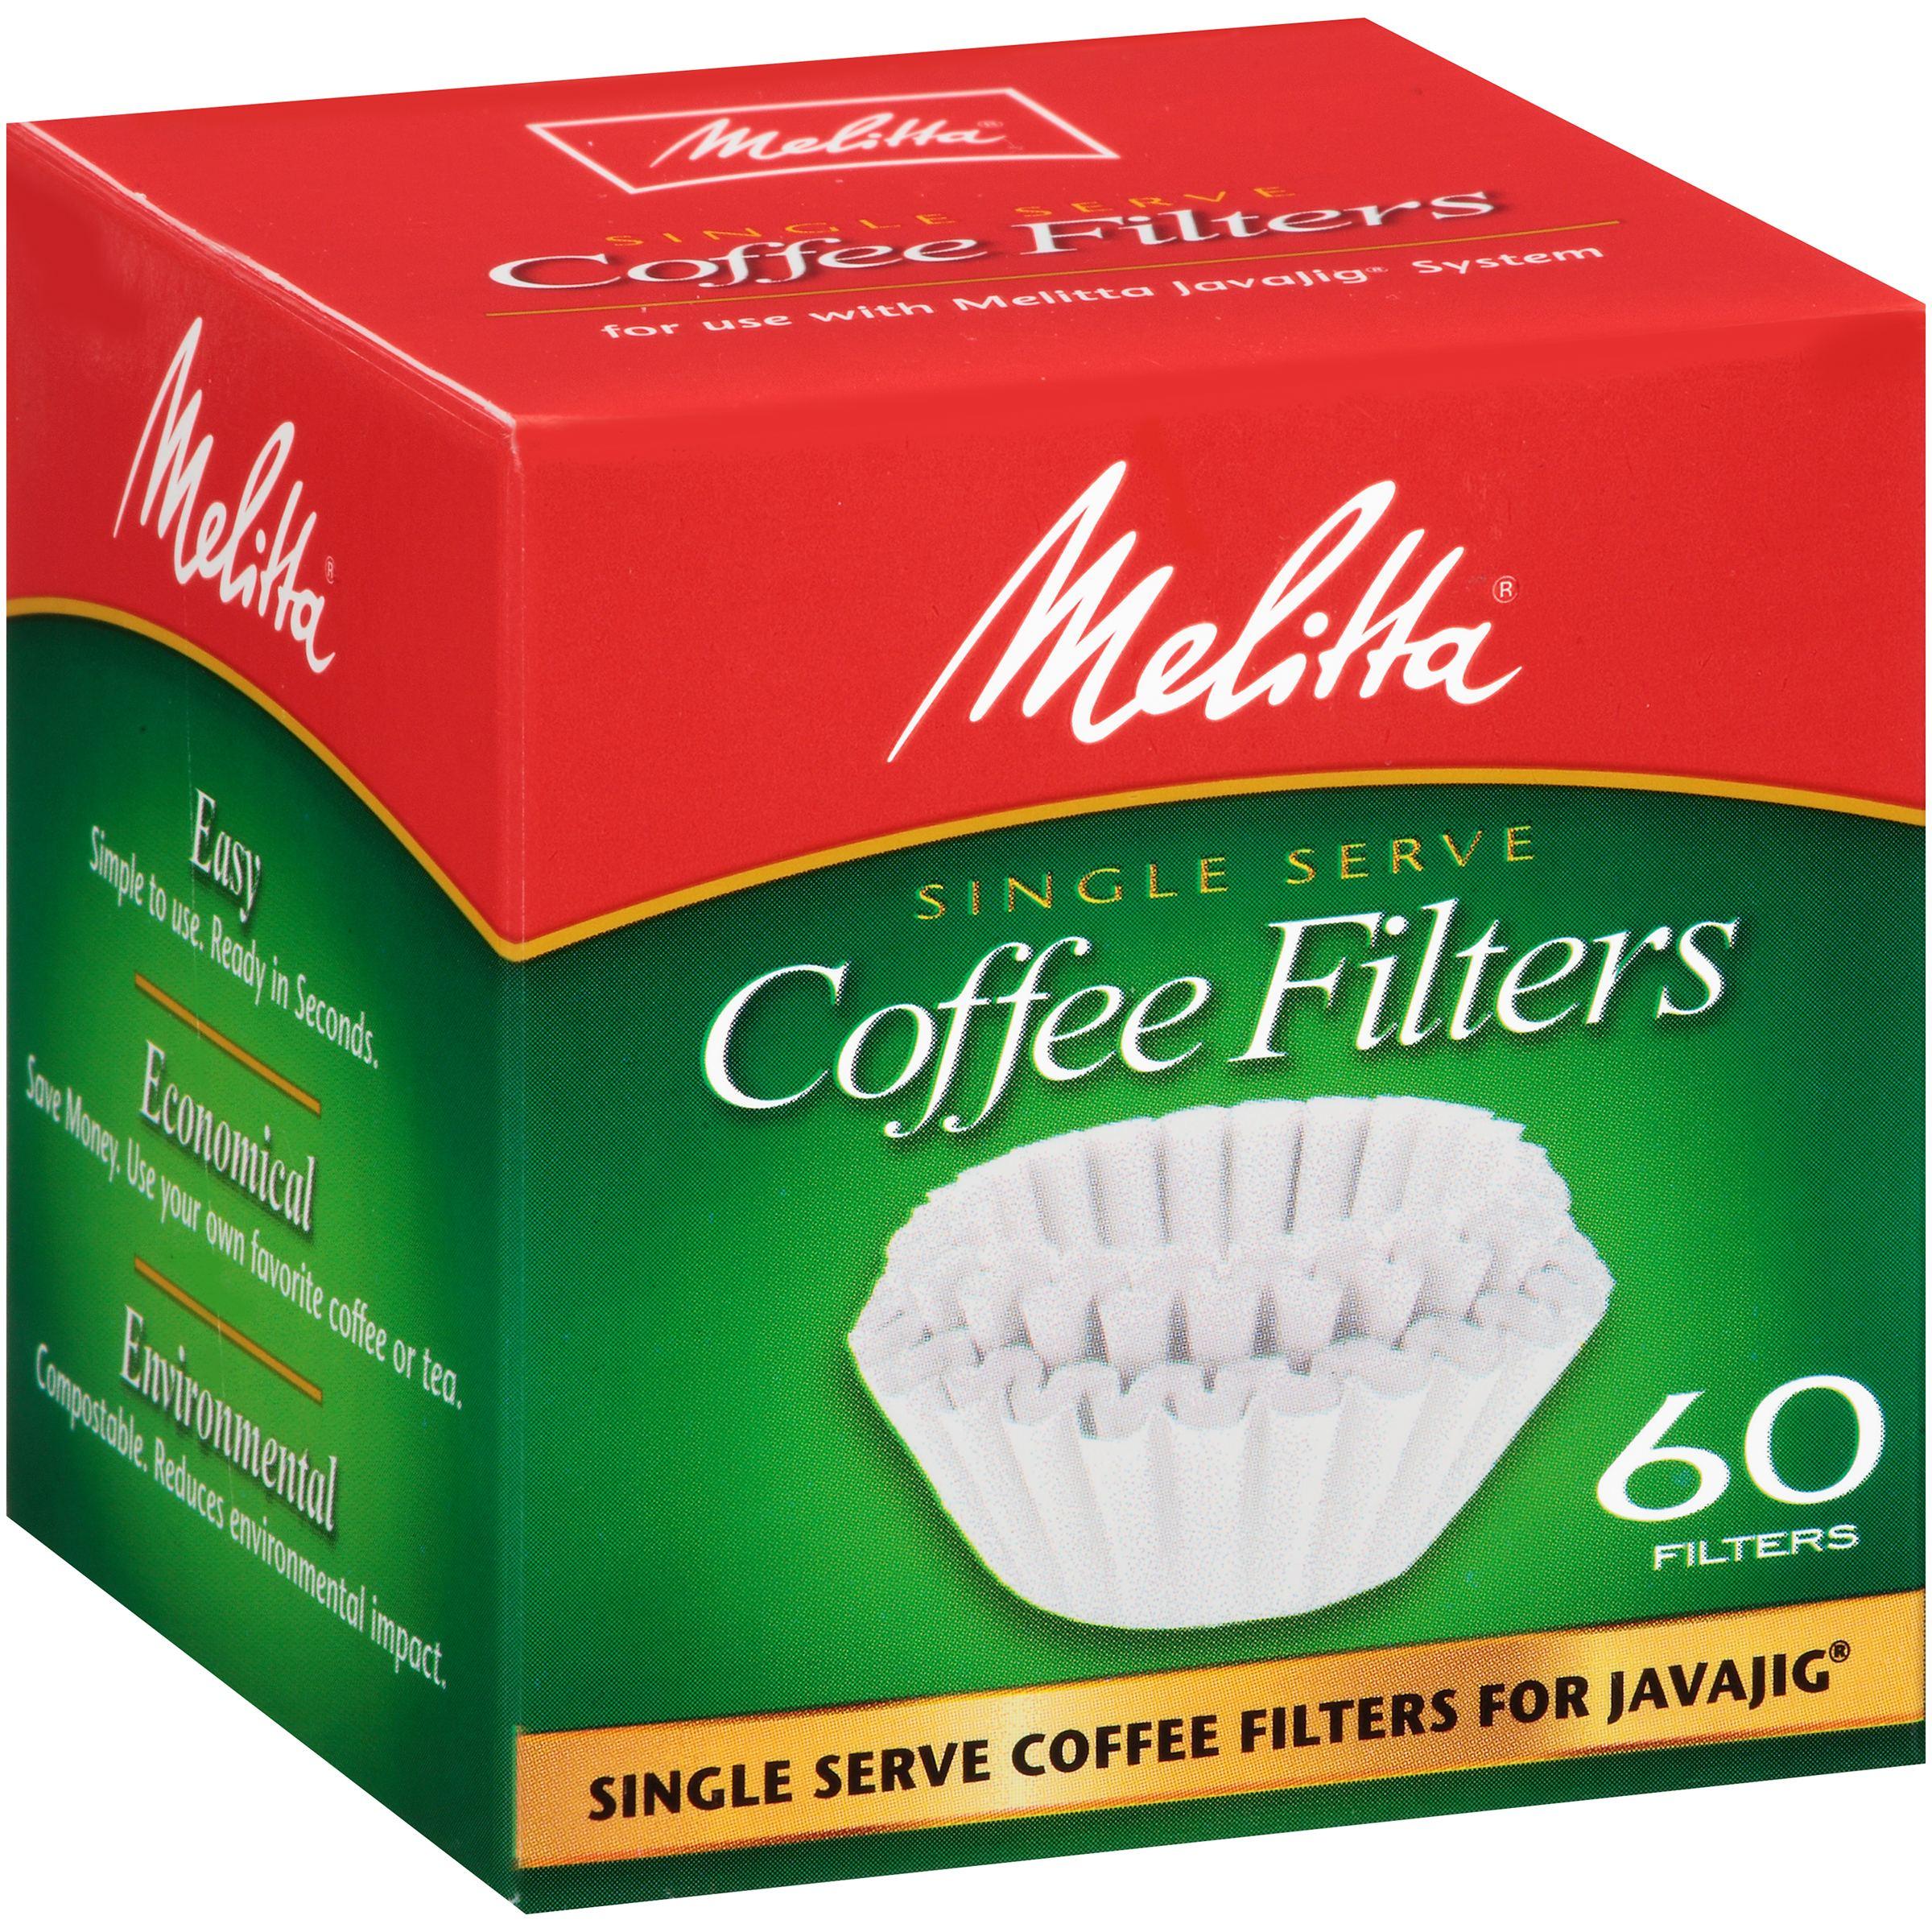 Melitta Coffee Filters Single Serve 60 CT by Melitta USA Inc.